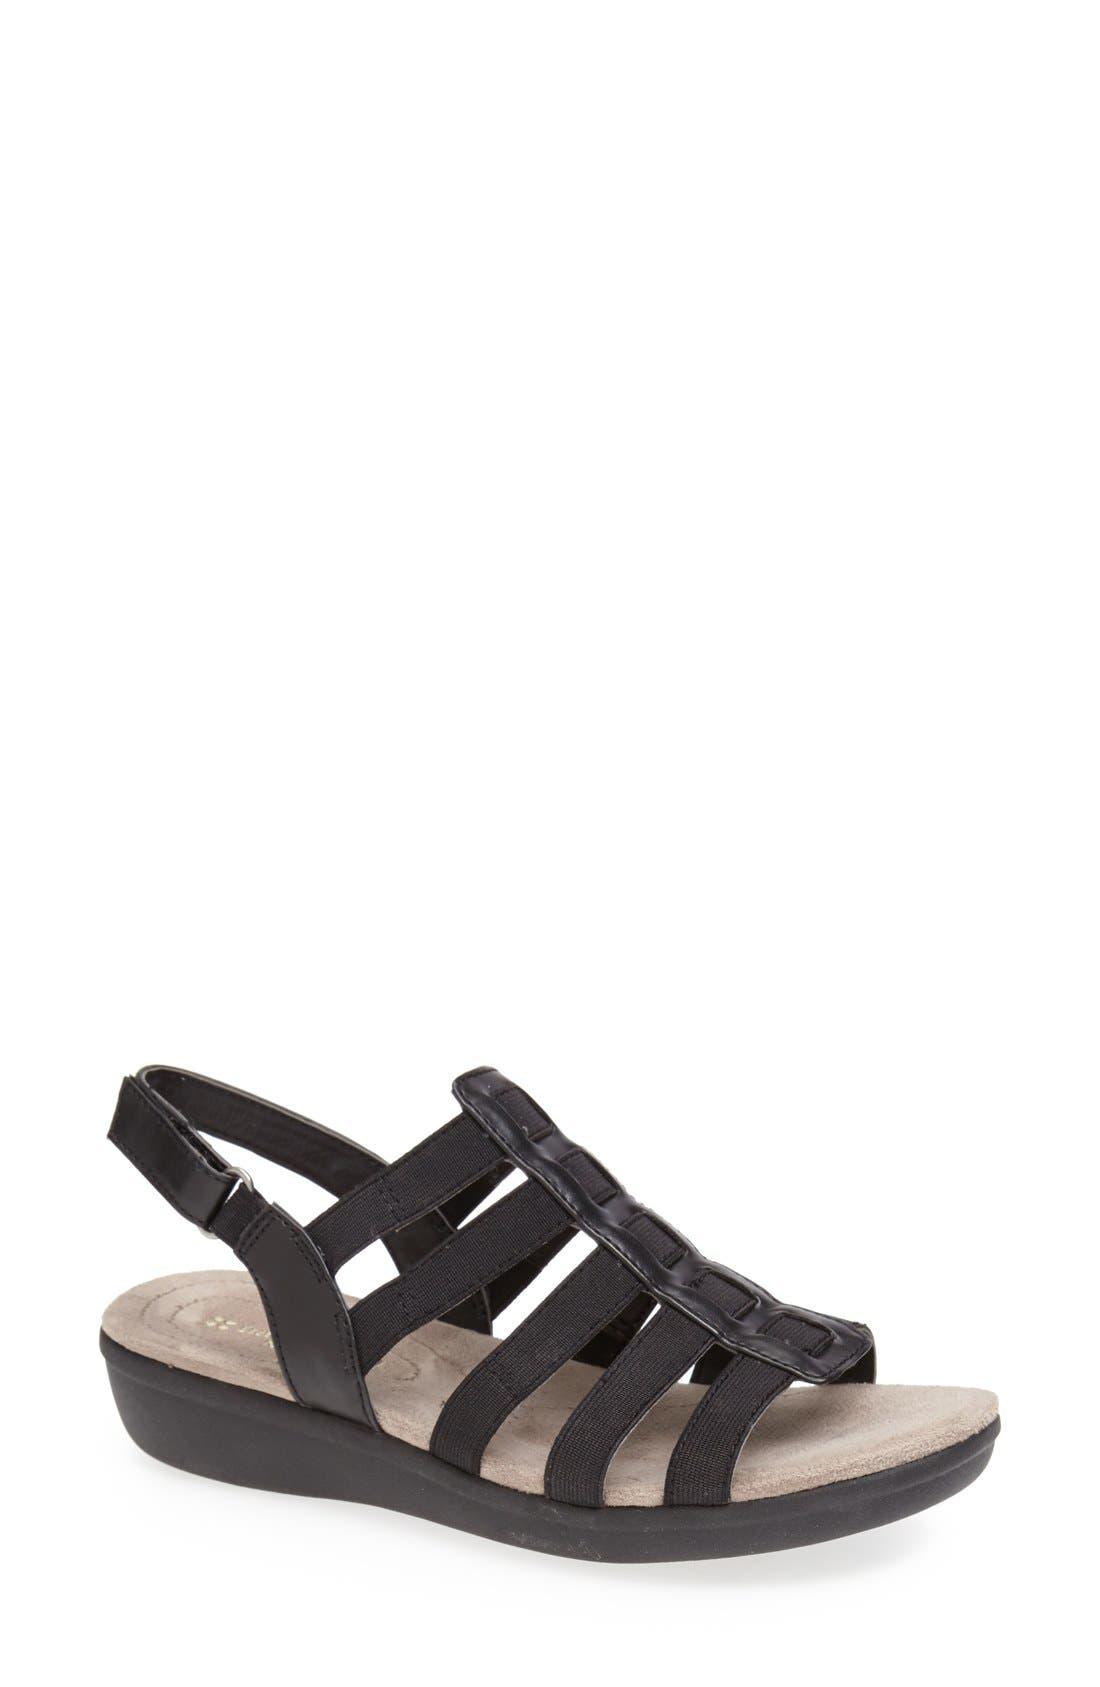 Main Image - Naturalizer 'Wyonna' Leather Sandal (Women)